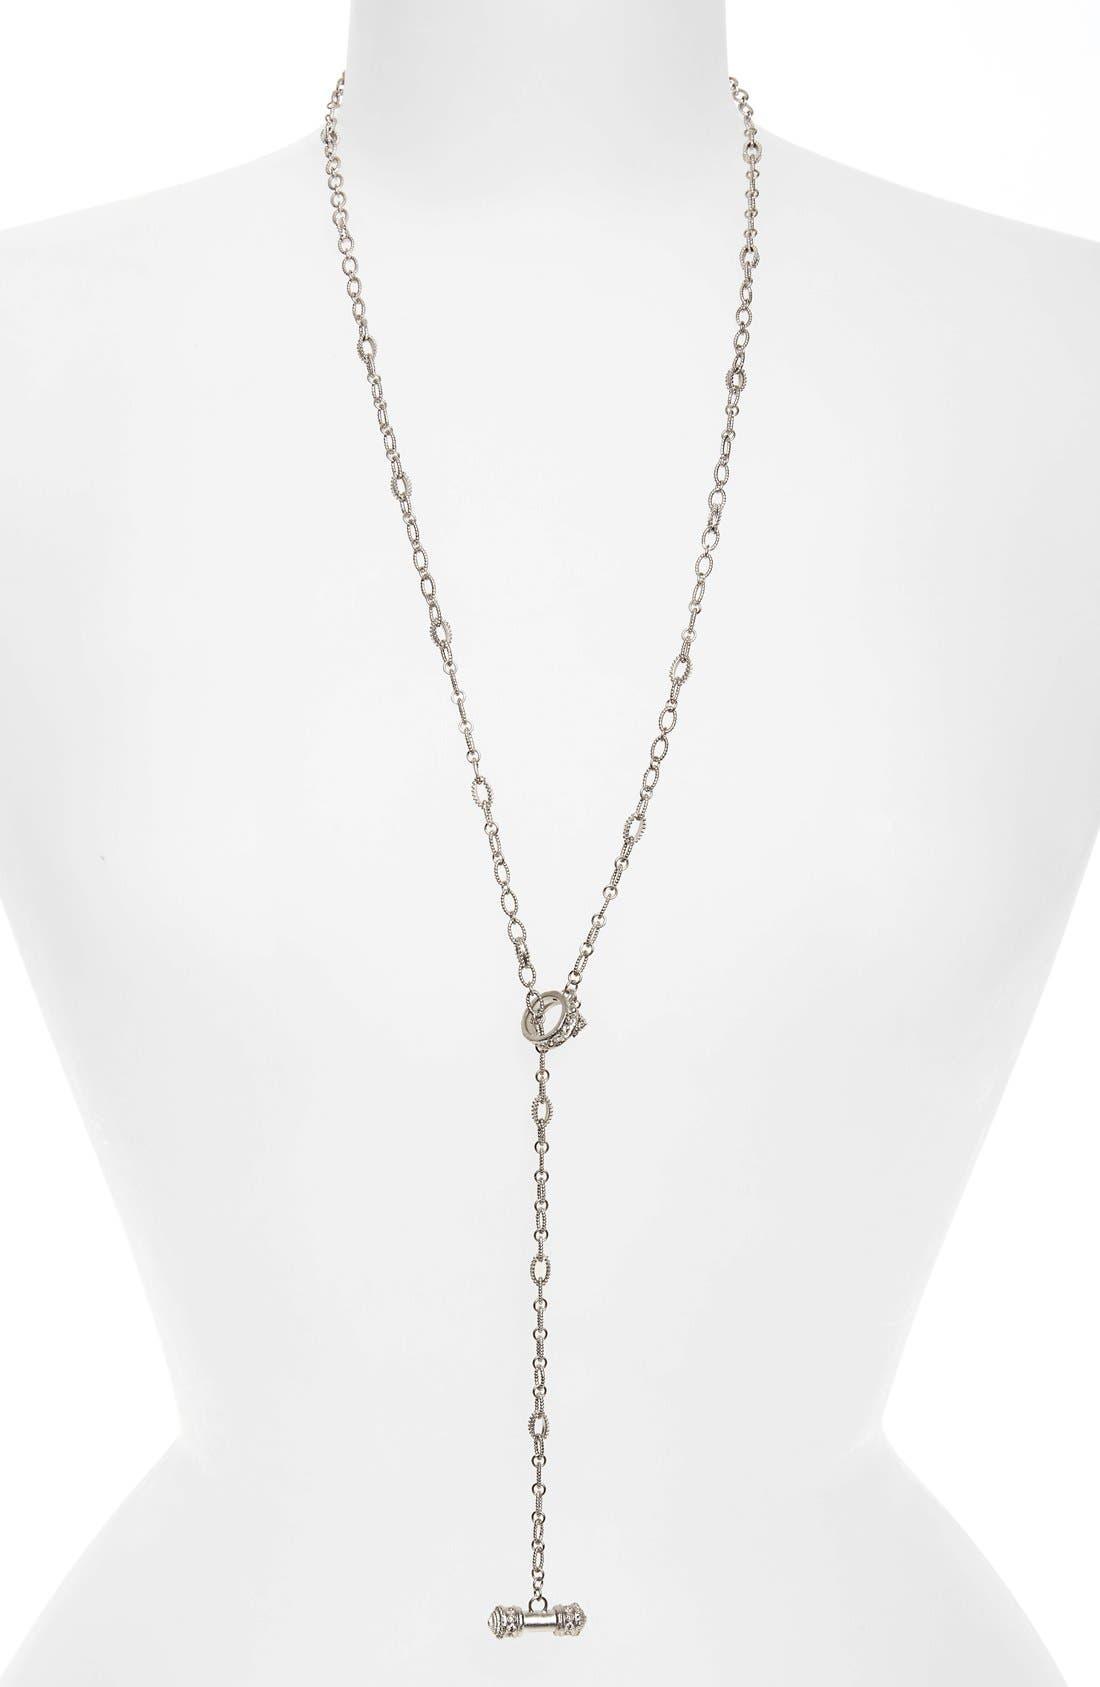 Armenta New World Triple-Strand Crivelli Necklace with Diamonds 1vBGdkP6